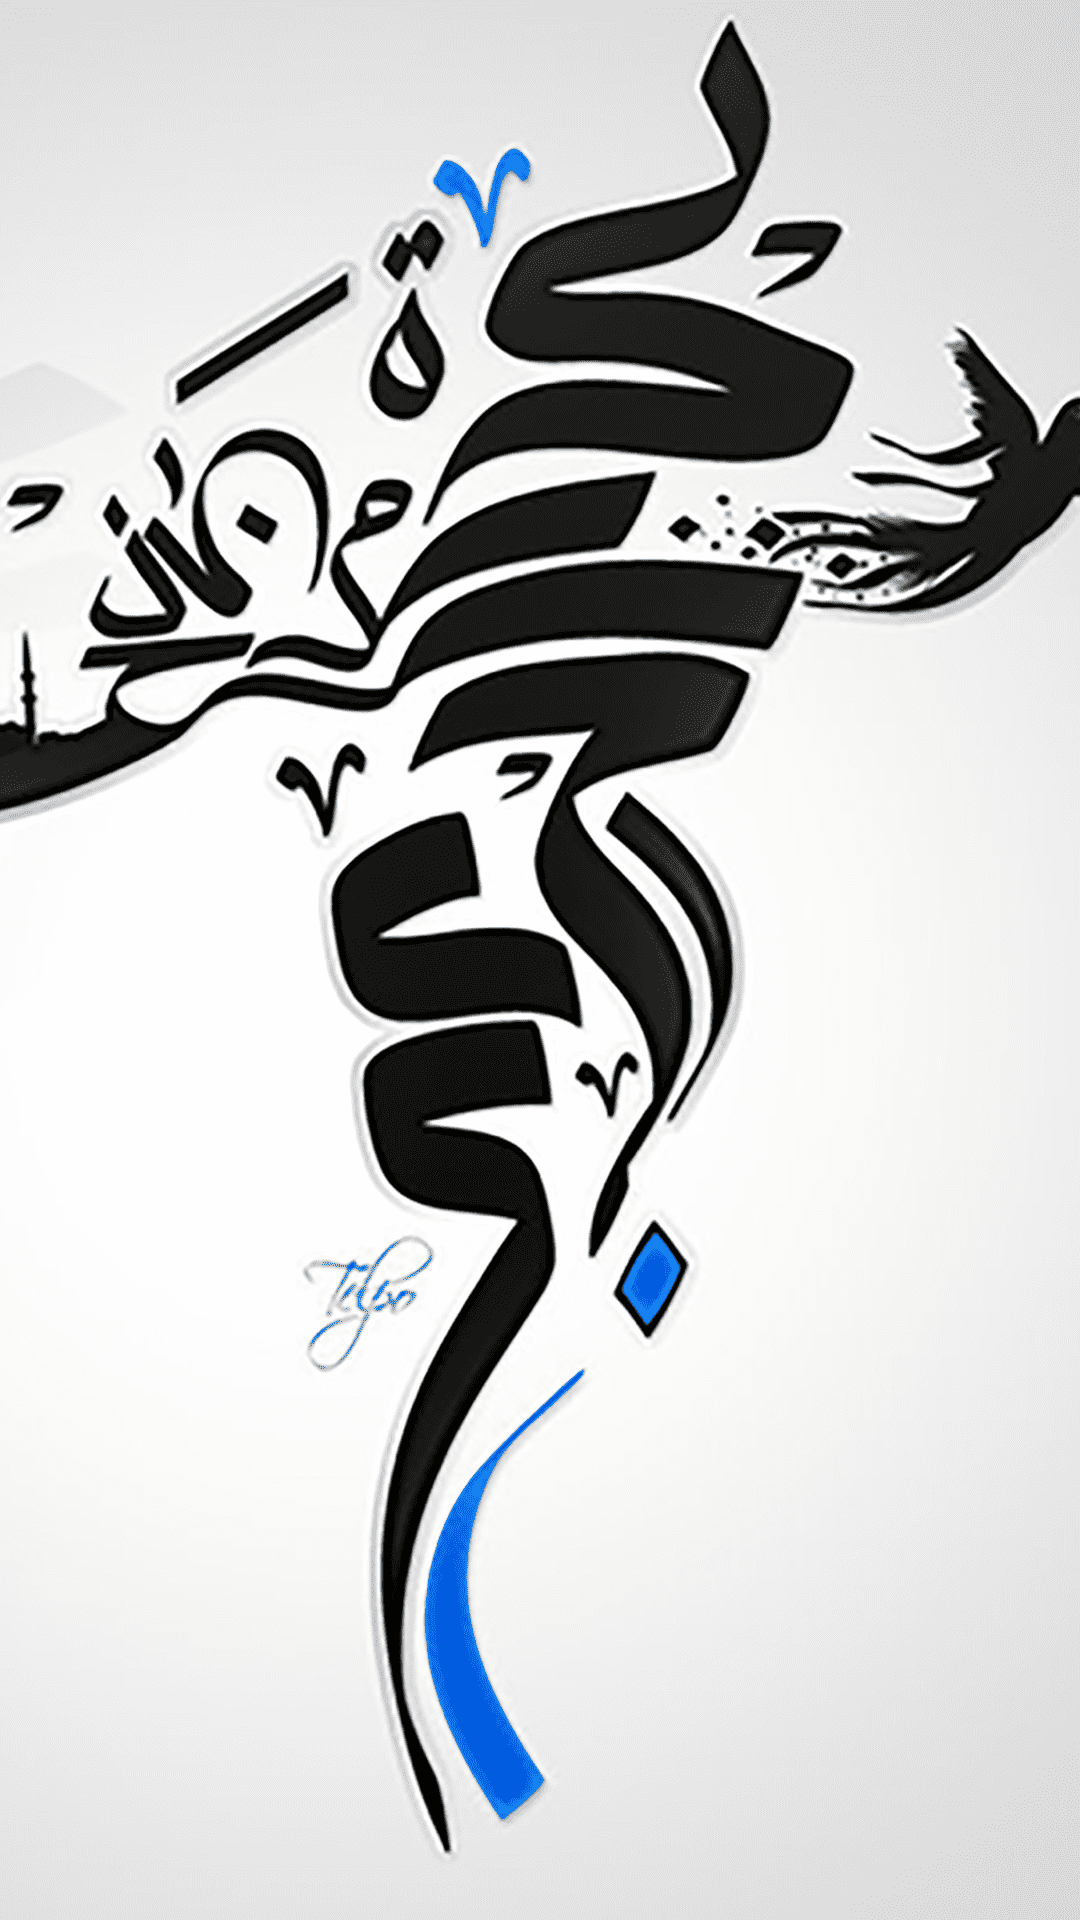 Wallpaper Islami Hd Keren Andro - Modern Arabic Calligraphy Designs , HD Wallpaper & Backgrounds